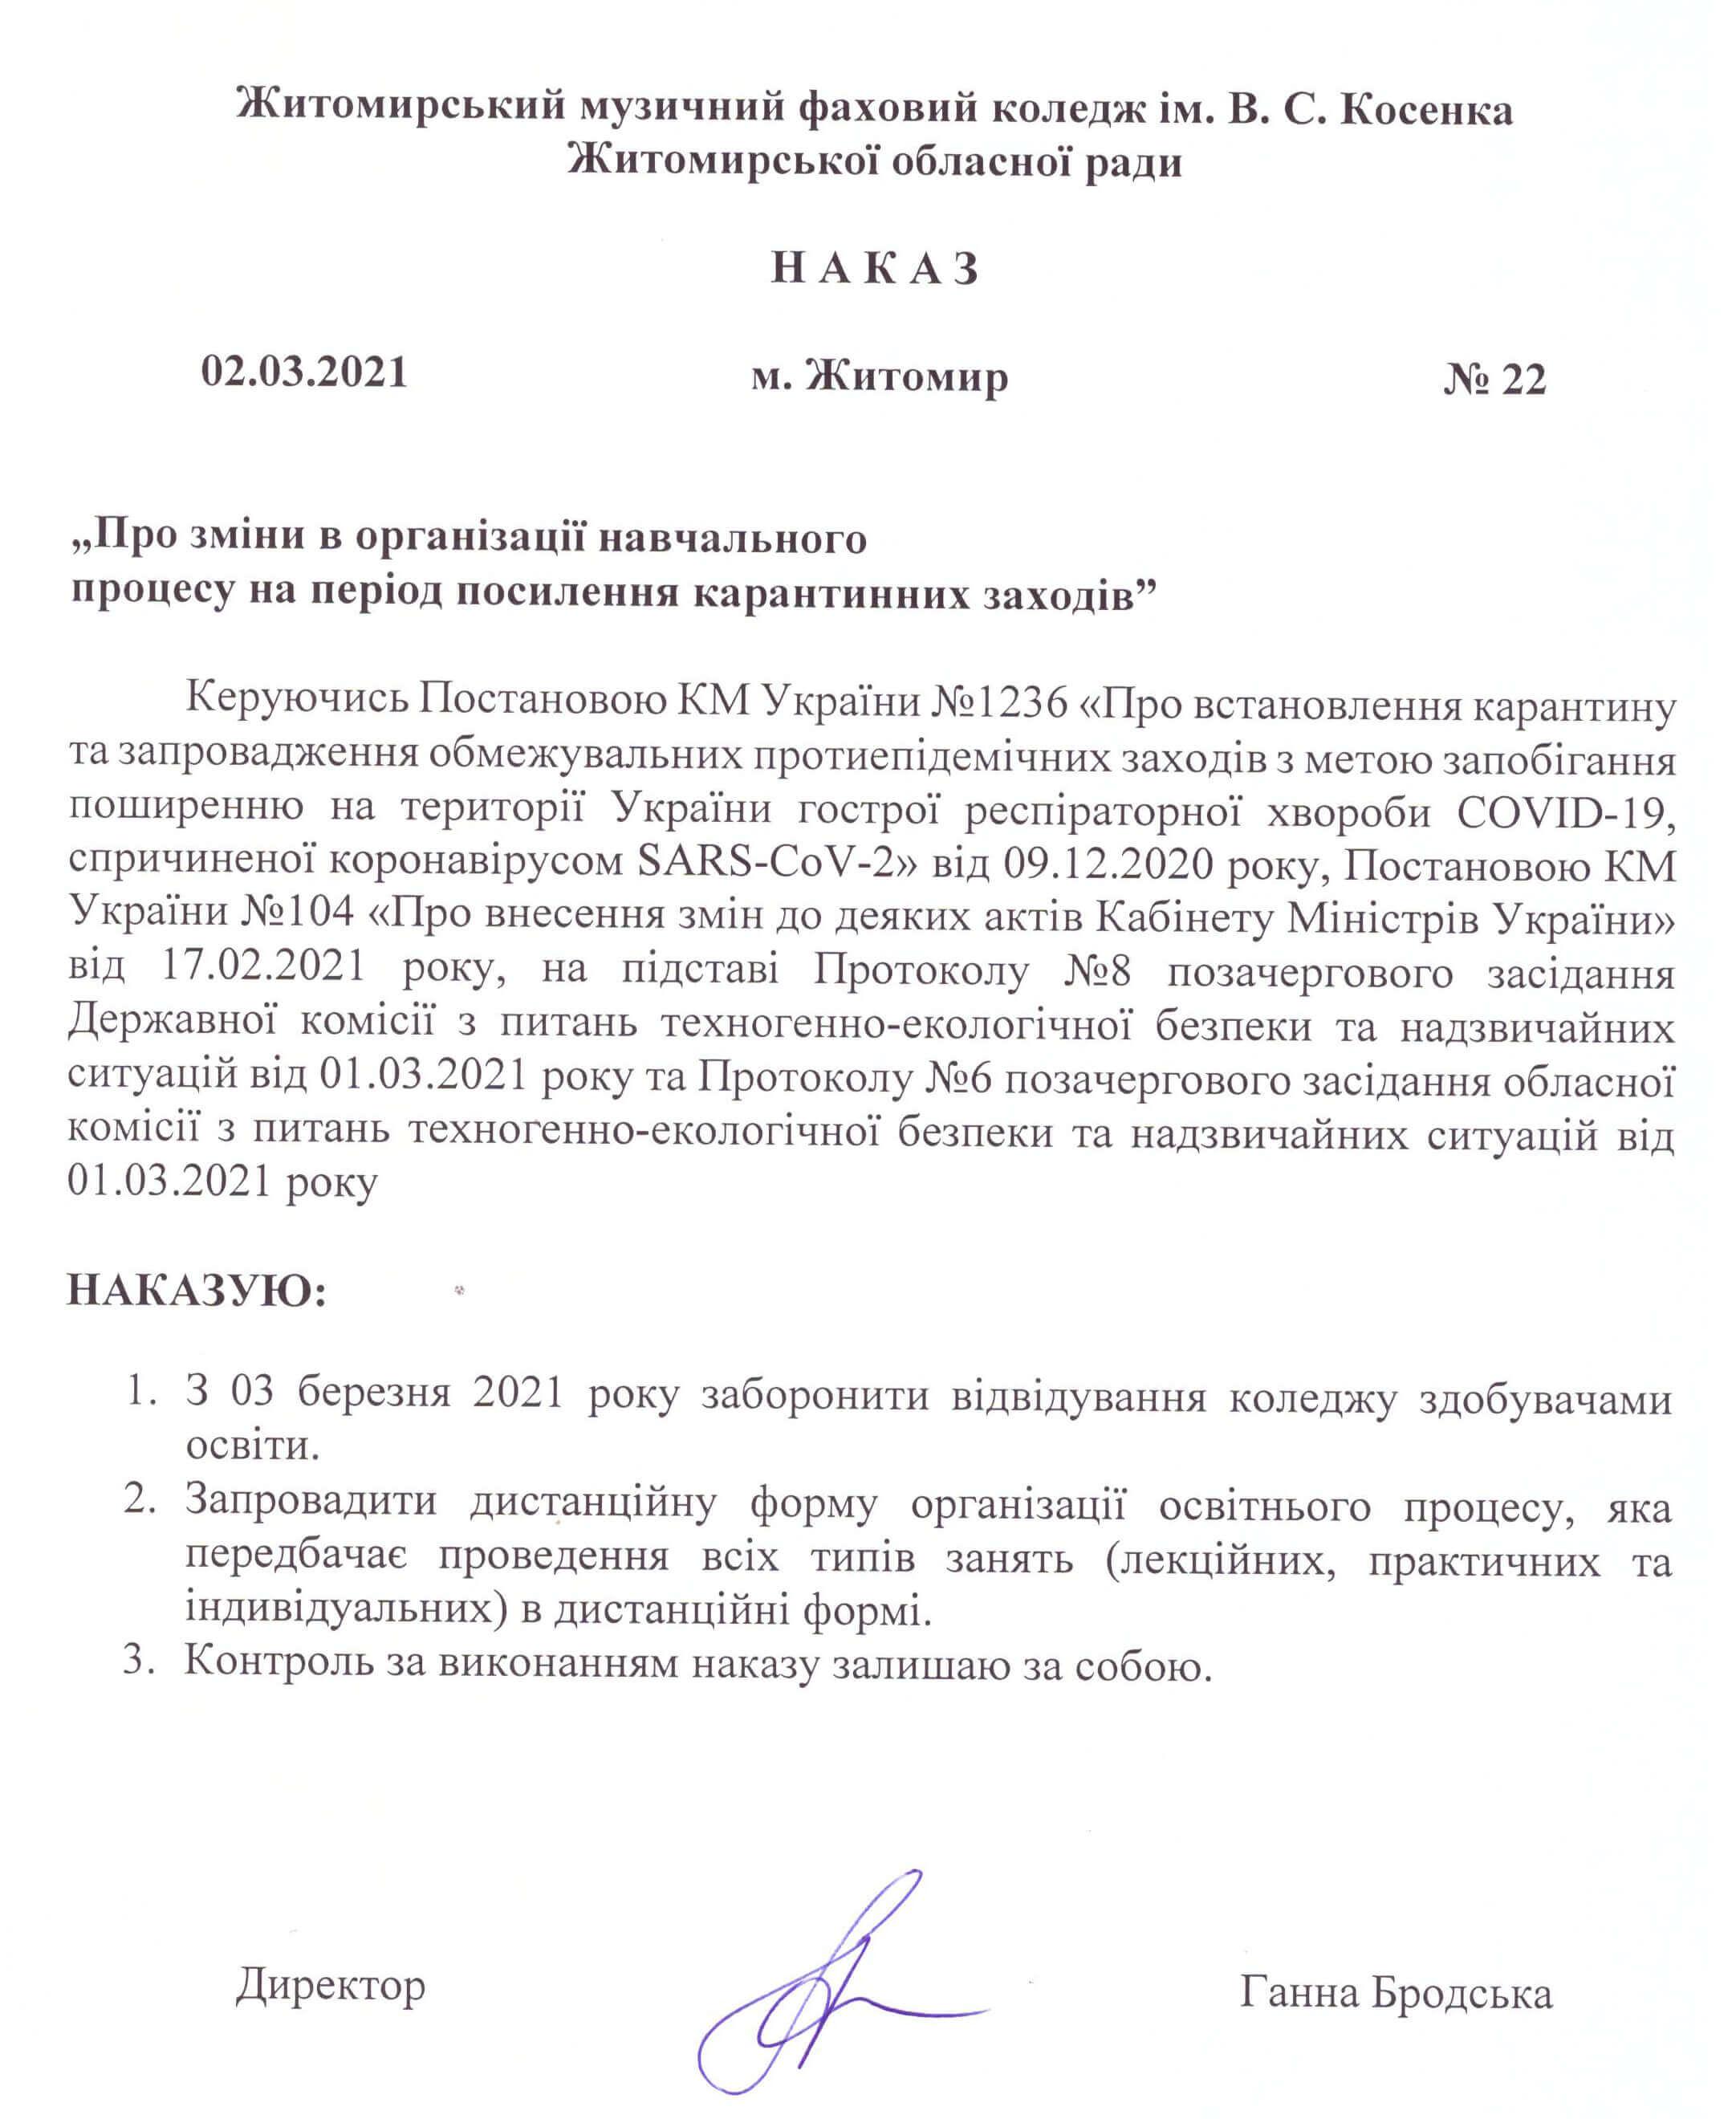 Наказ директора коледжу ЖМФК